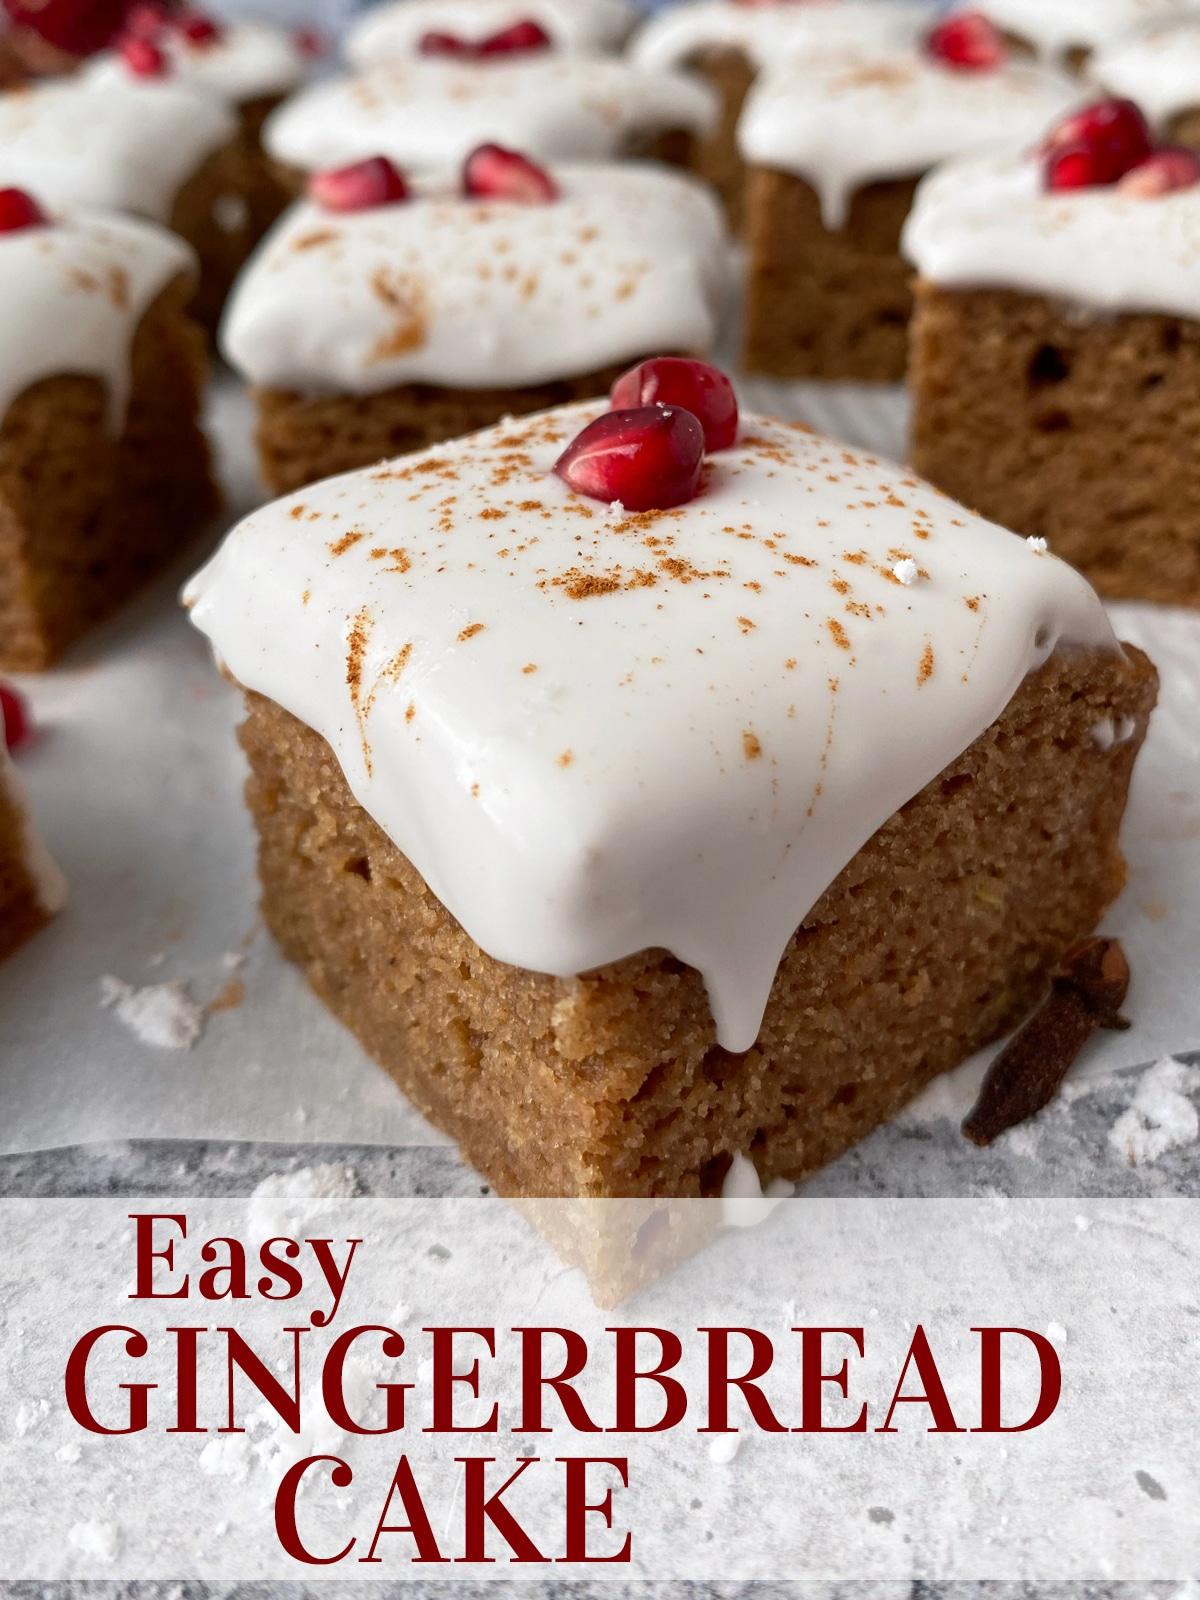 Easy-Gingerbread-Cake-Recipe